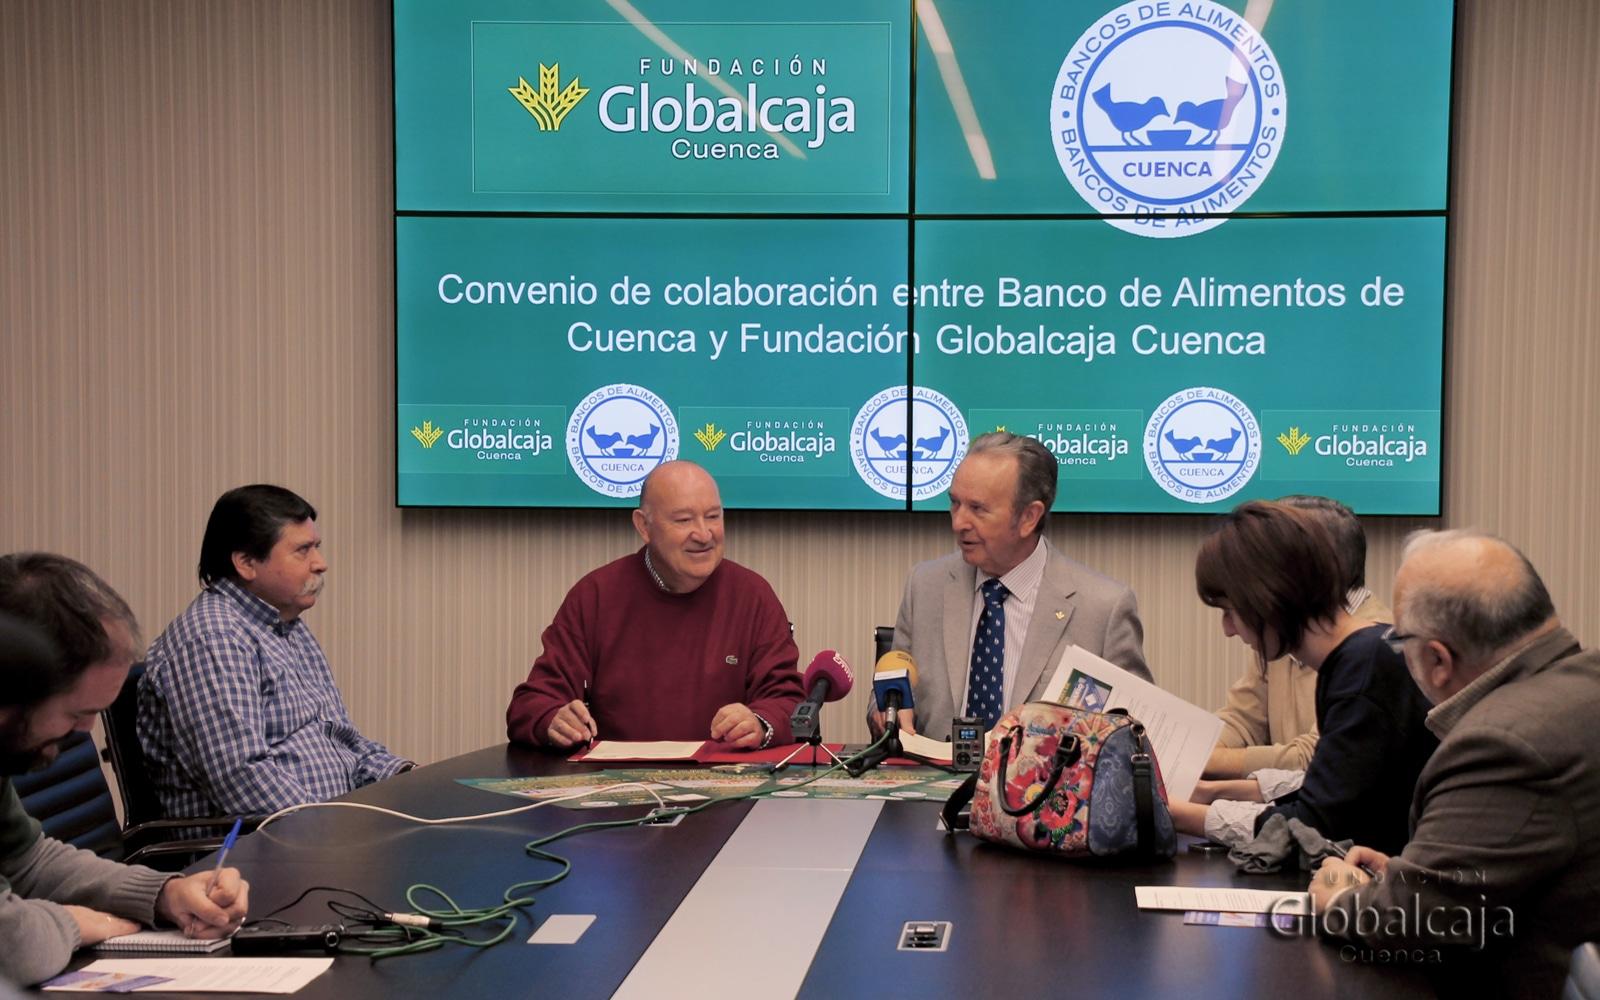 https://blog.globalcaja.es/wp-content/uploads/2017/11/MG_3713_W.jpg